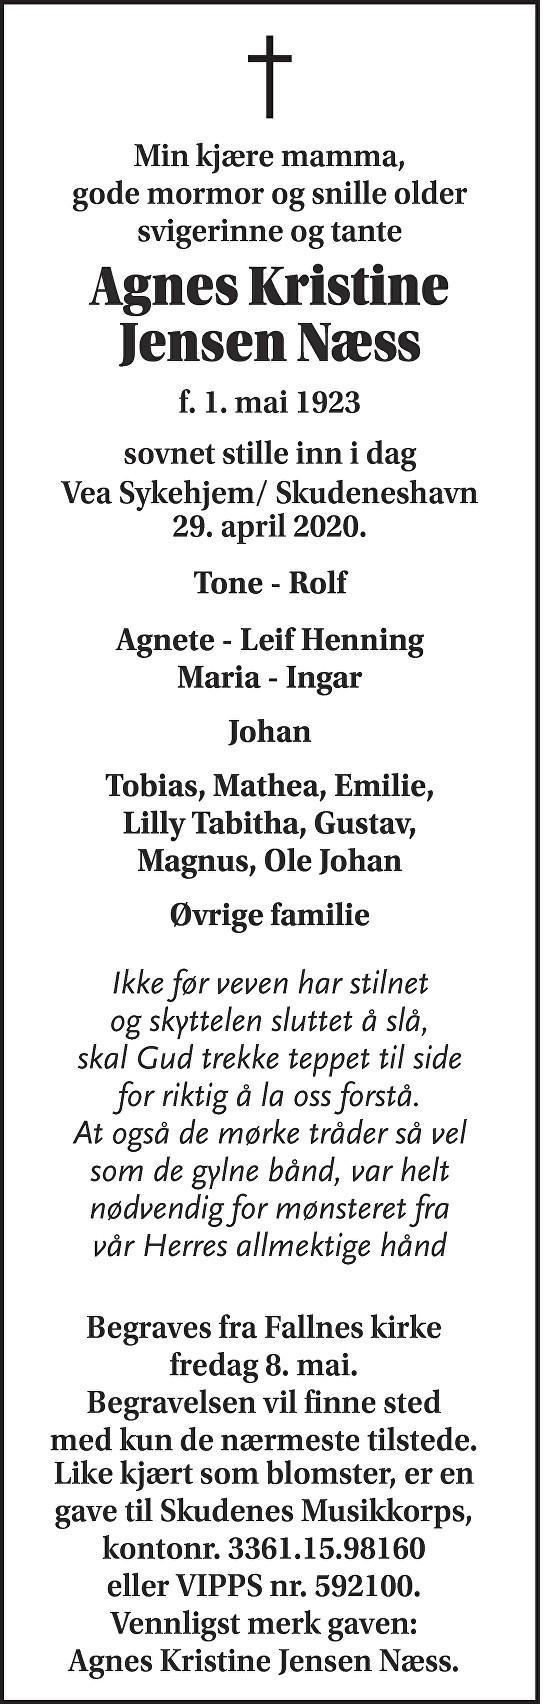 Agnes Kristine Jensen Næss Dødsannonse